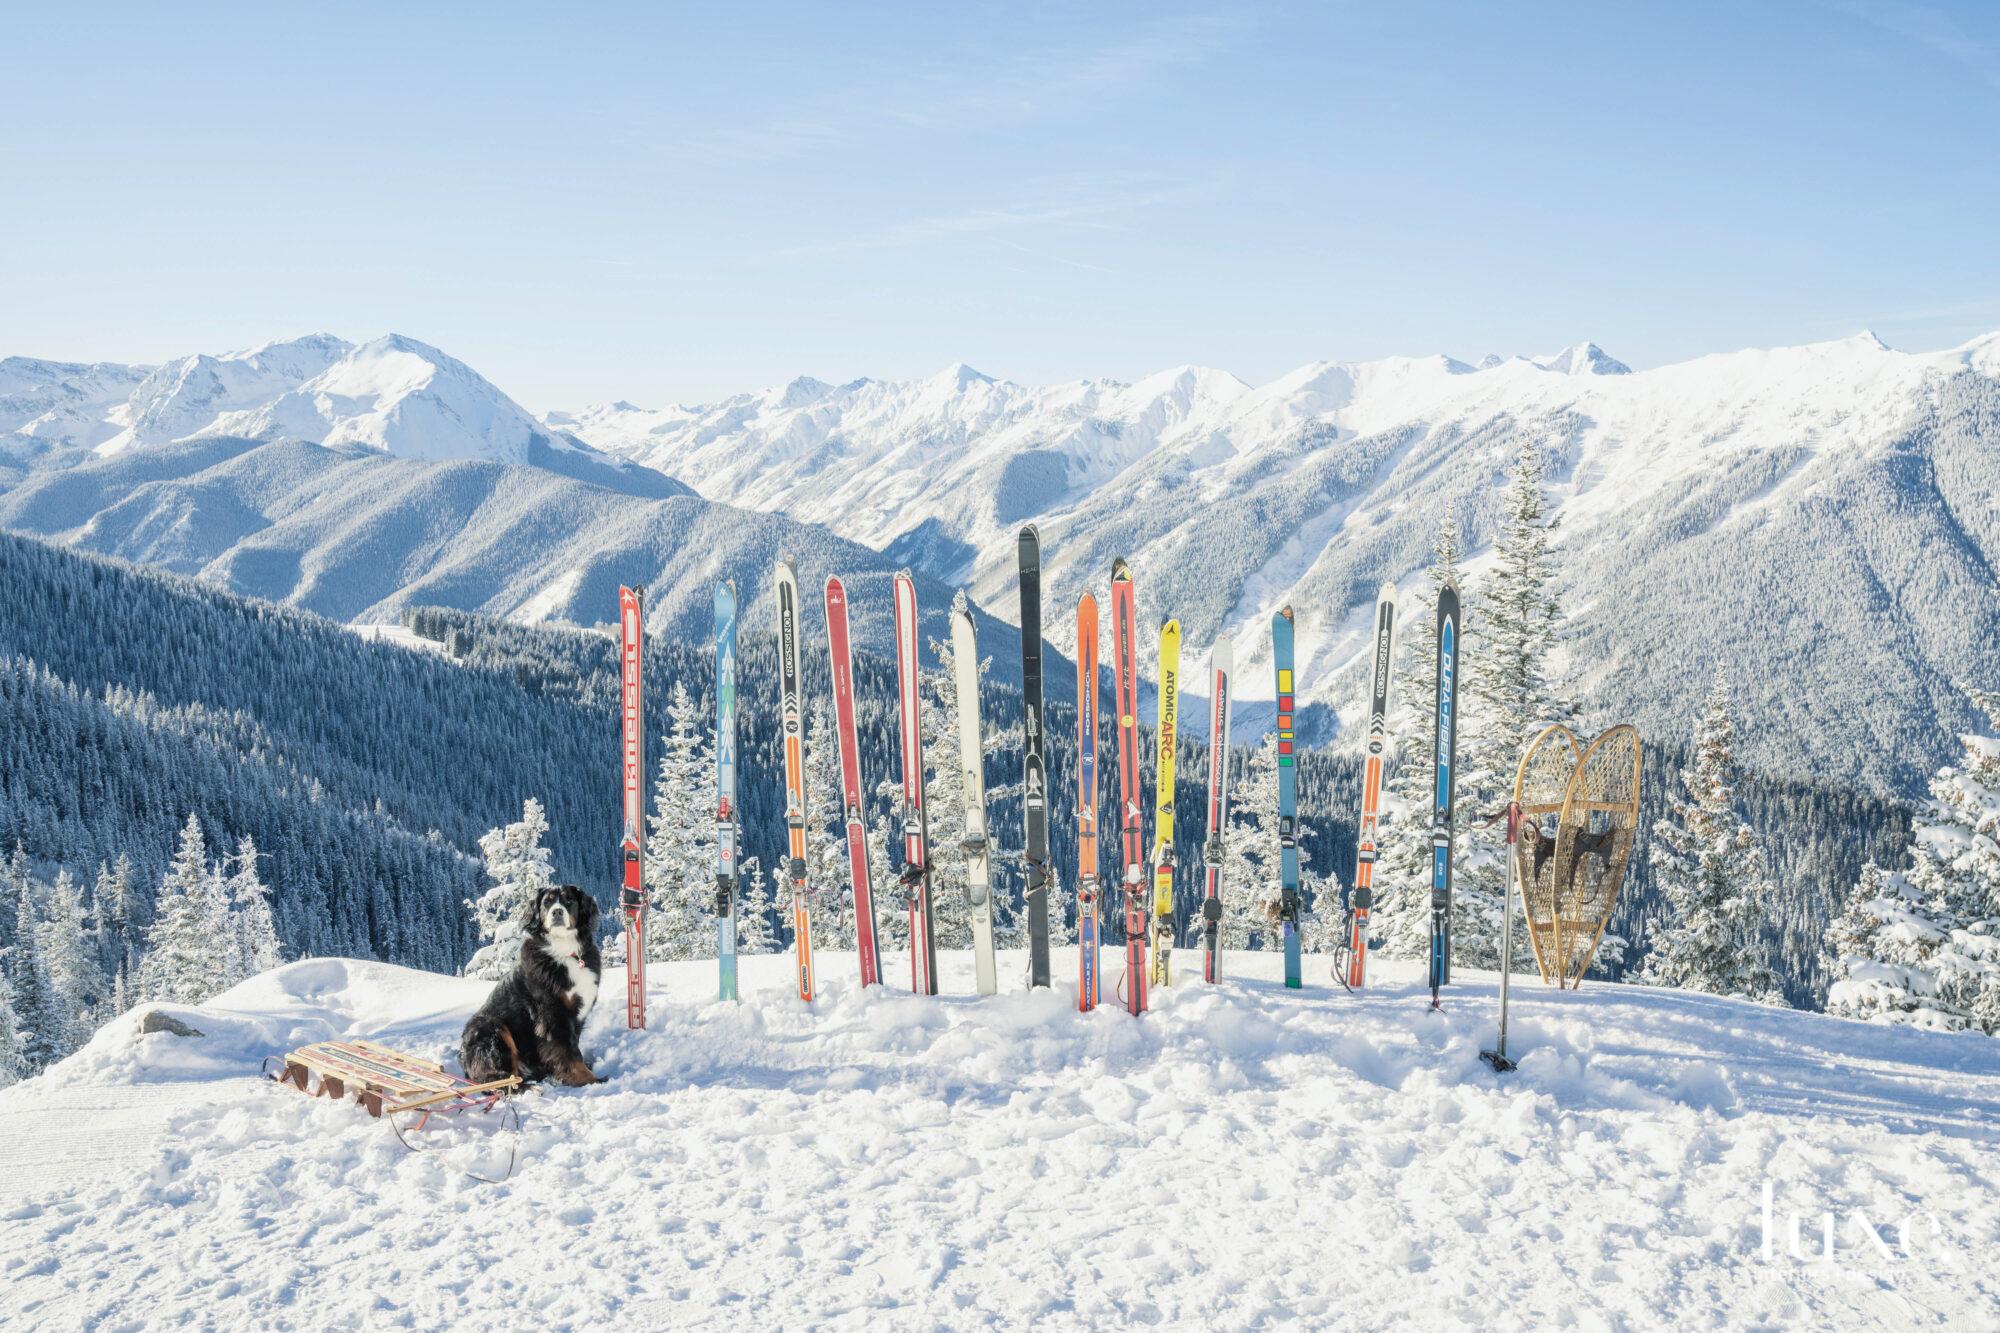 Mountain scene with skis